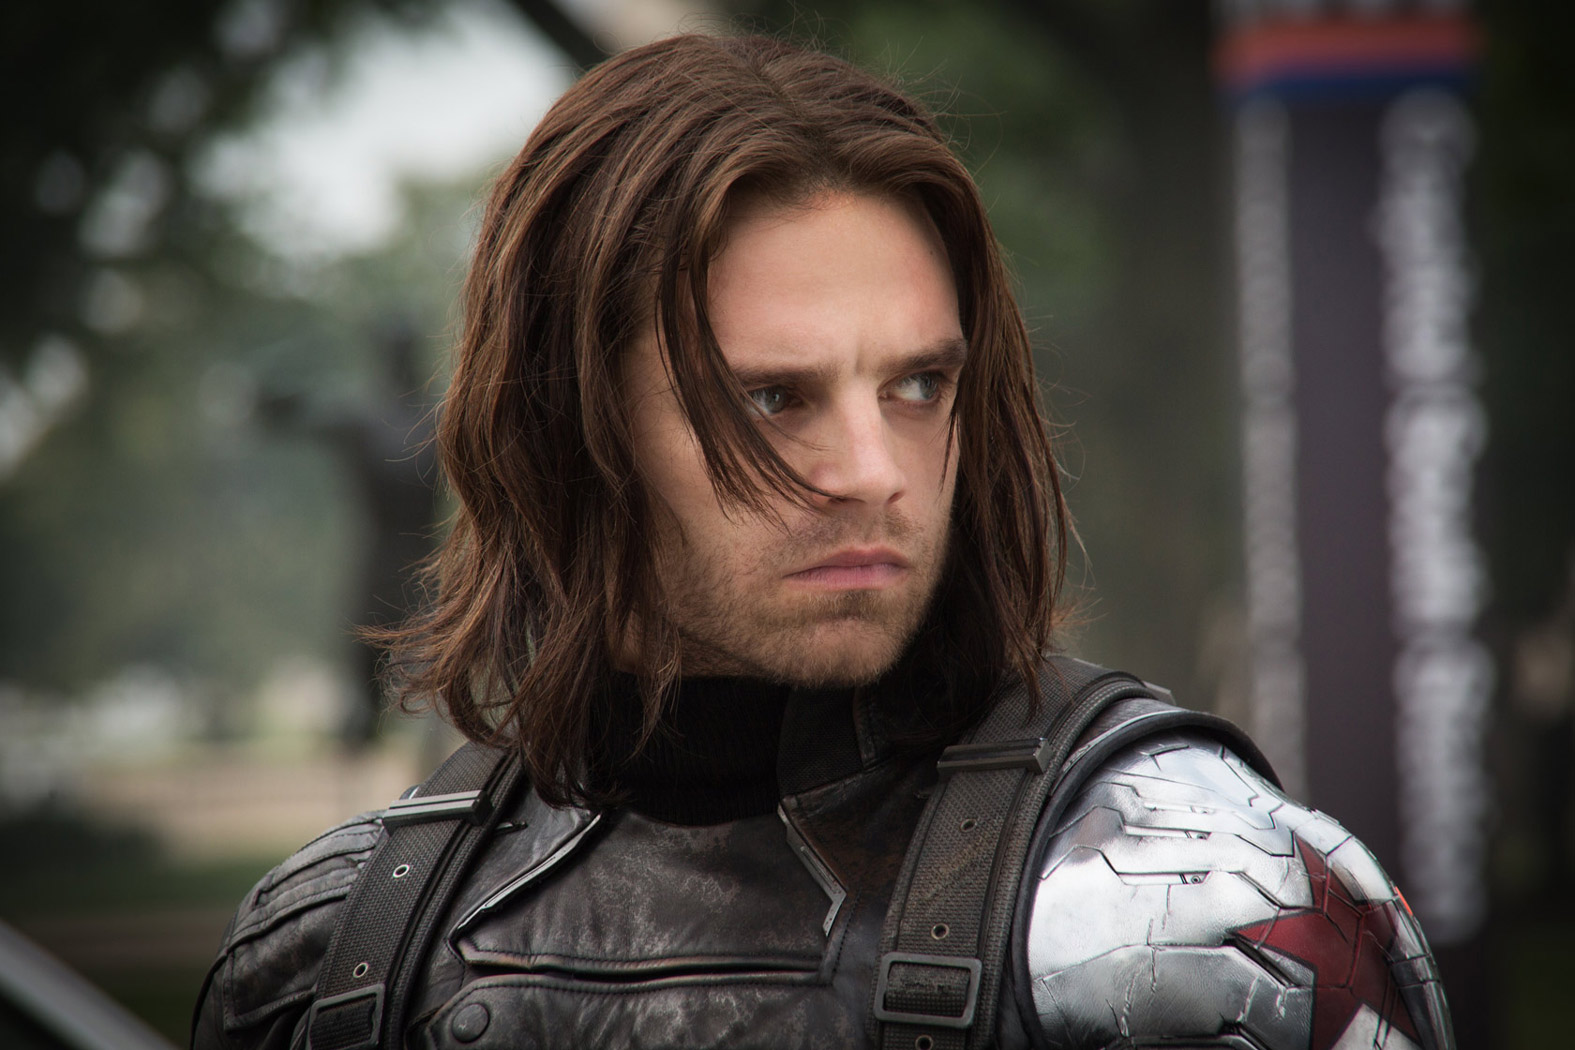 Captain-America-2-Official-Photo-Winter-Soldier-Sebastian-Stan-close-up